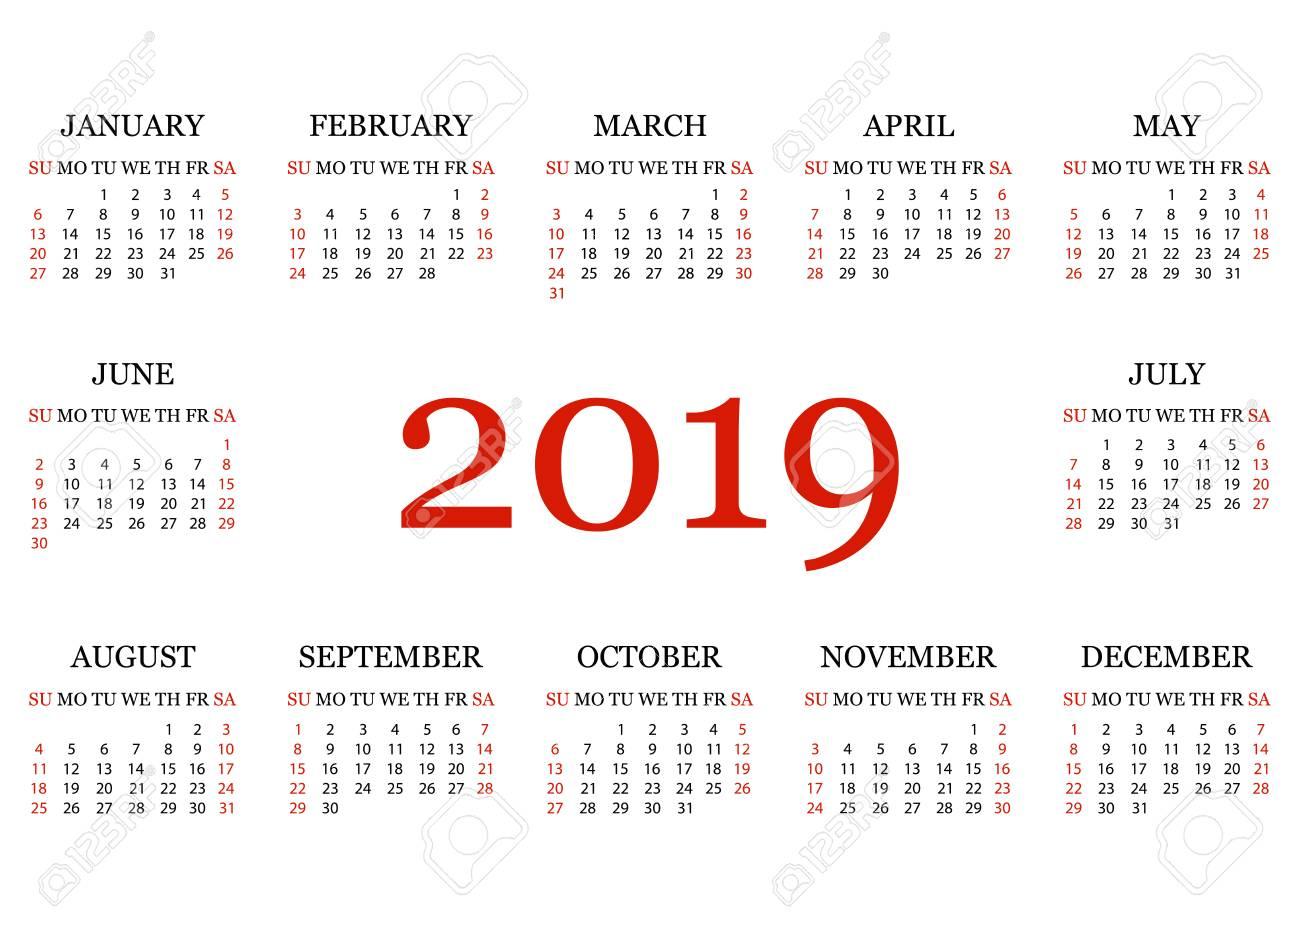 Calendar 2019  Simple Calendar template for year 2019  White